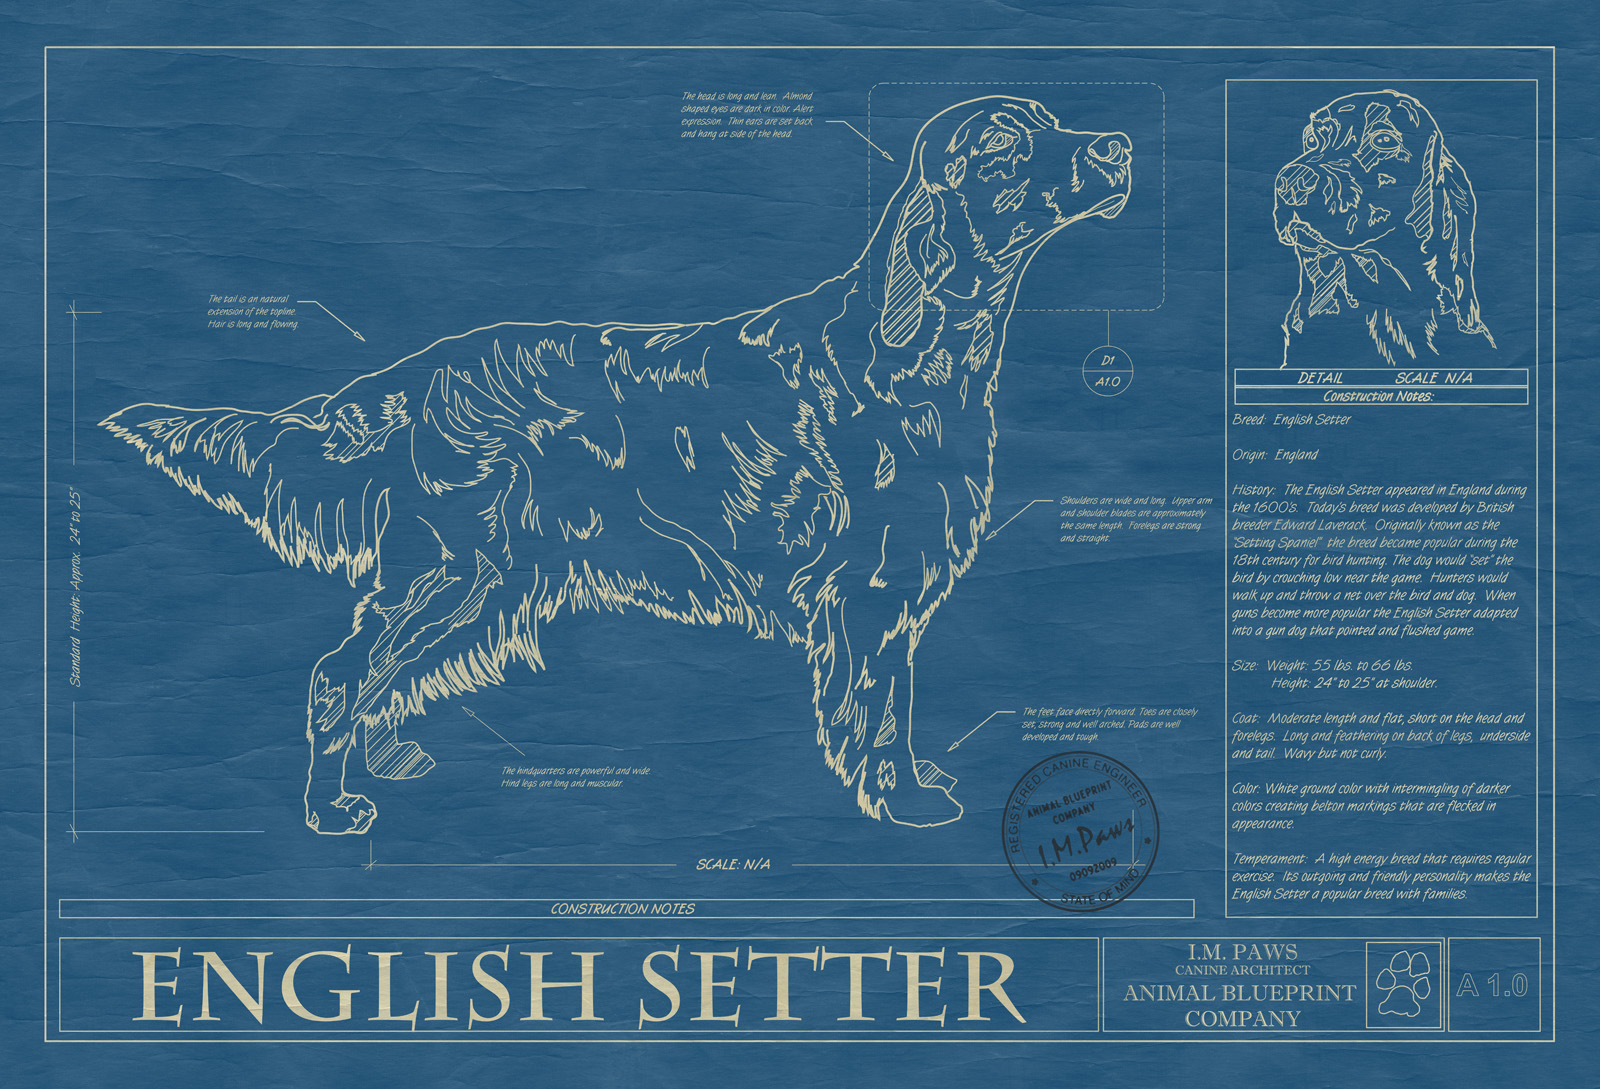 English setter animal blueprint company english setter dog blueprint malvernweather Gallery